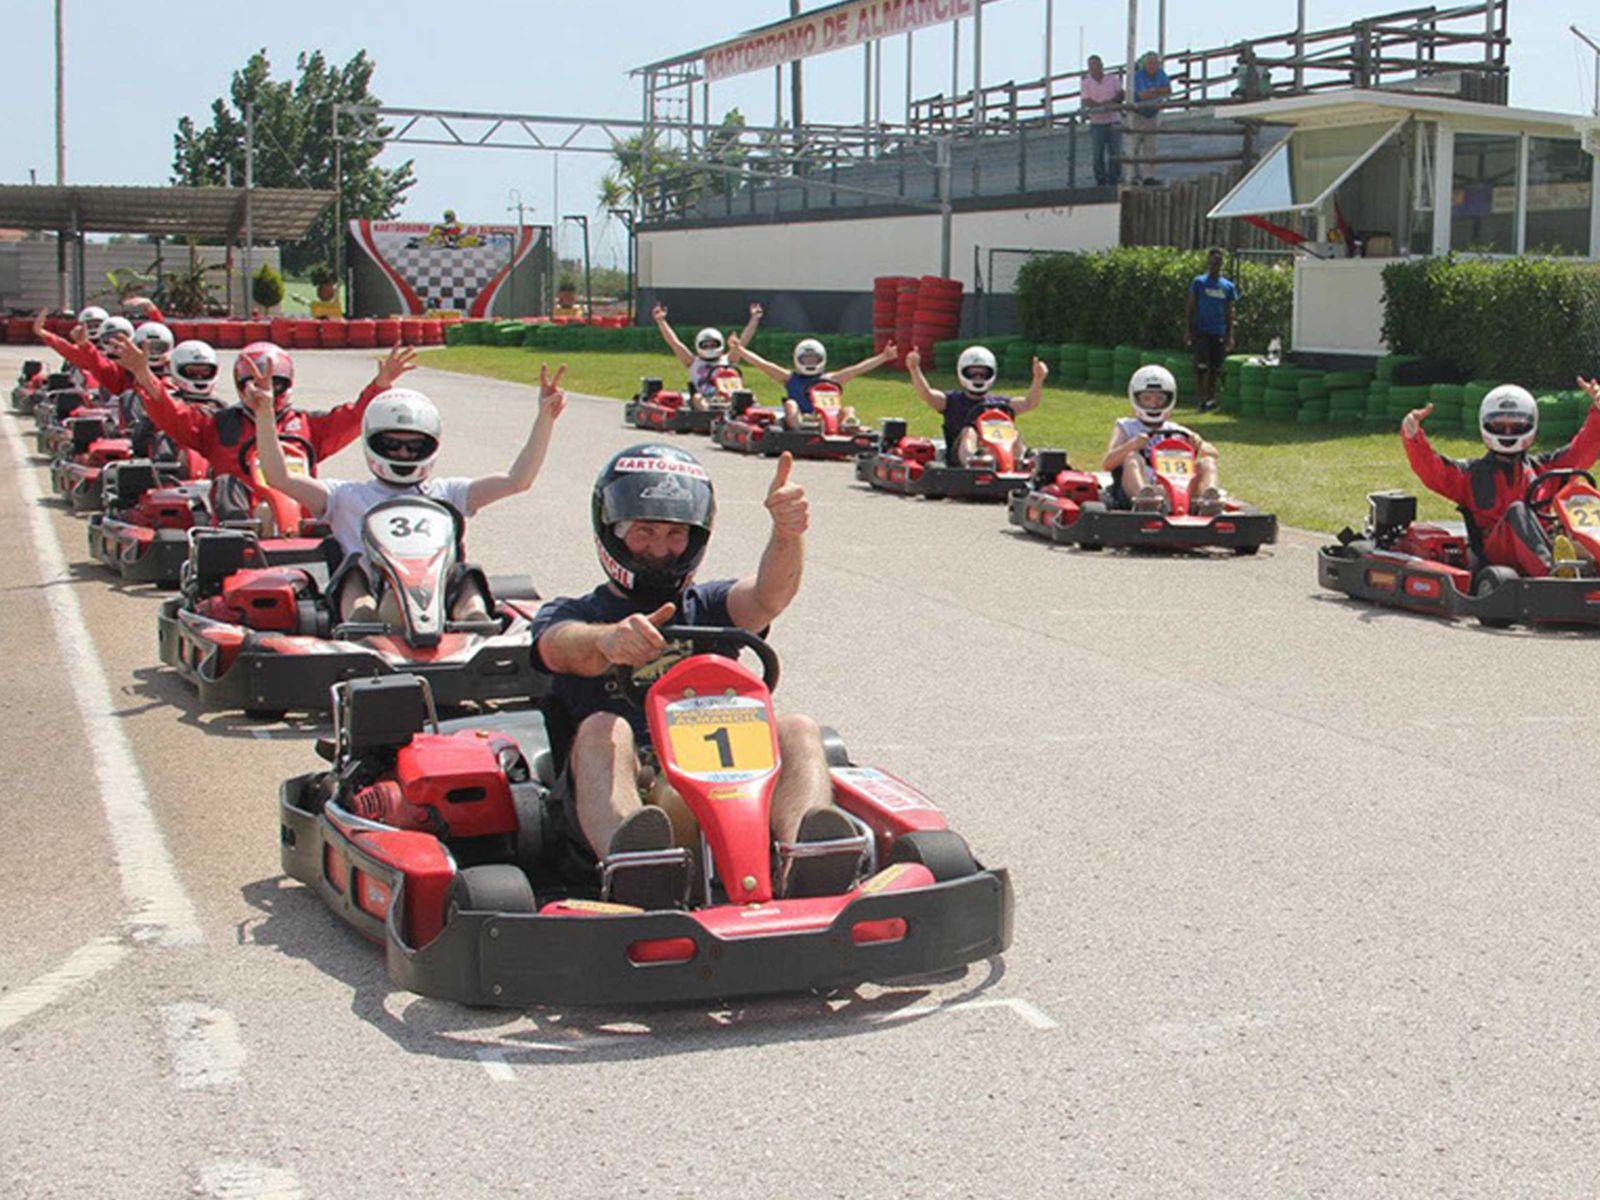 Outdoor Go Karting Stag Do in Albufeira